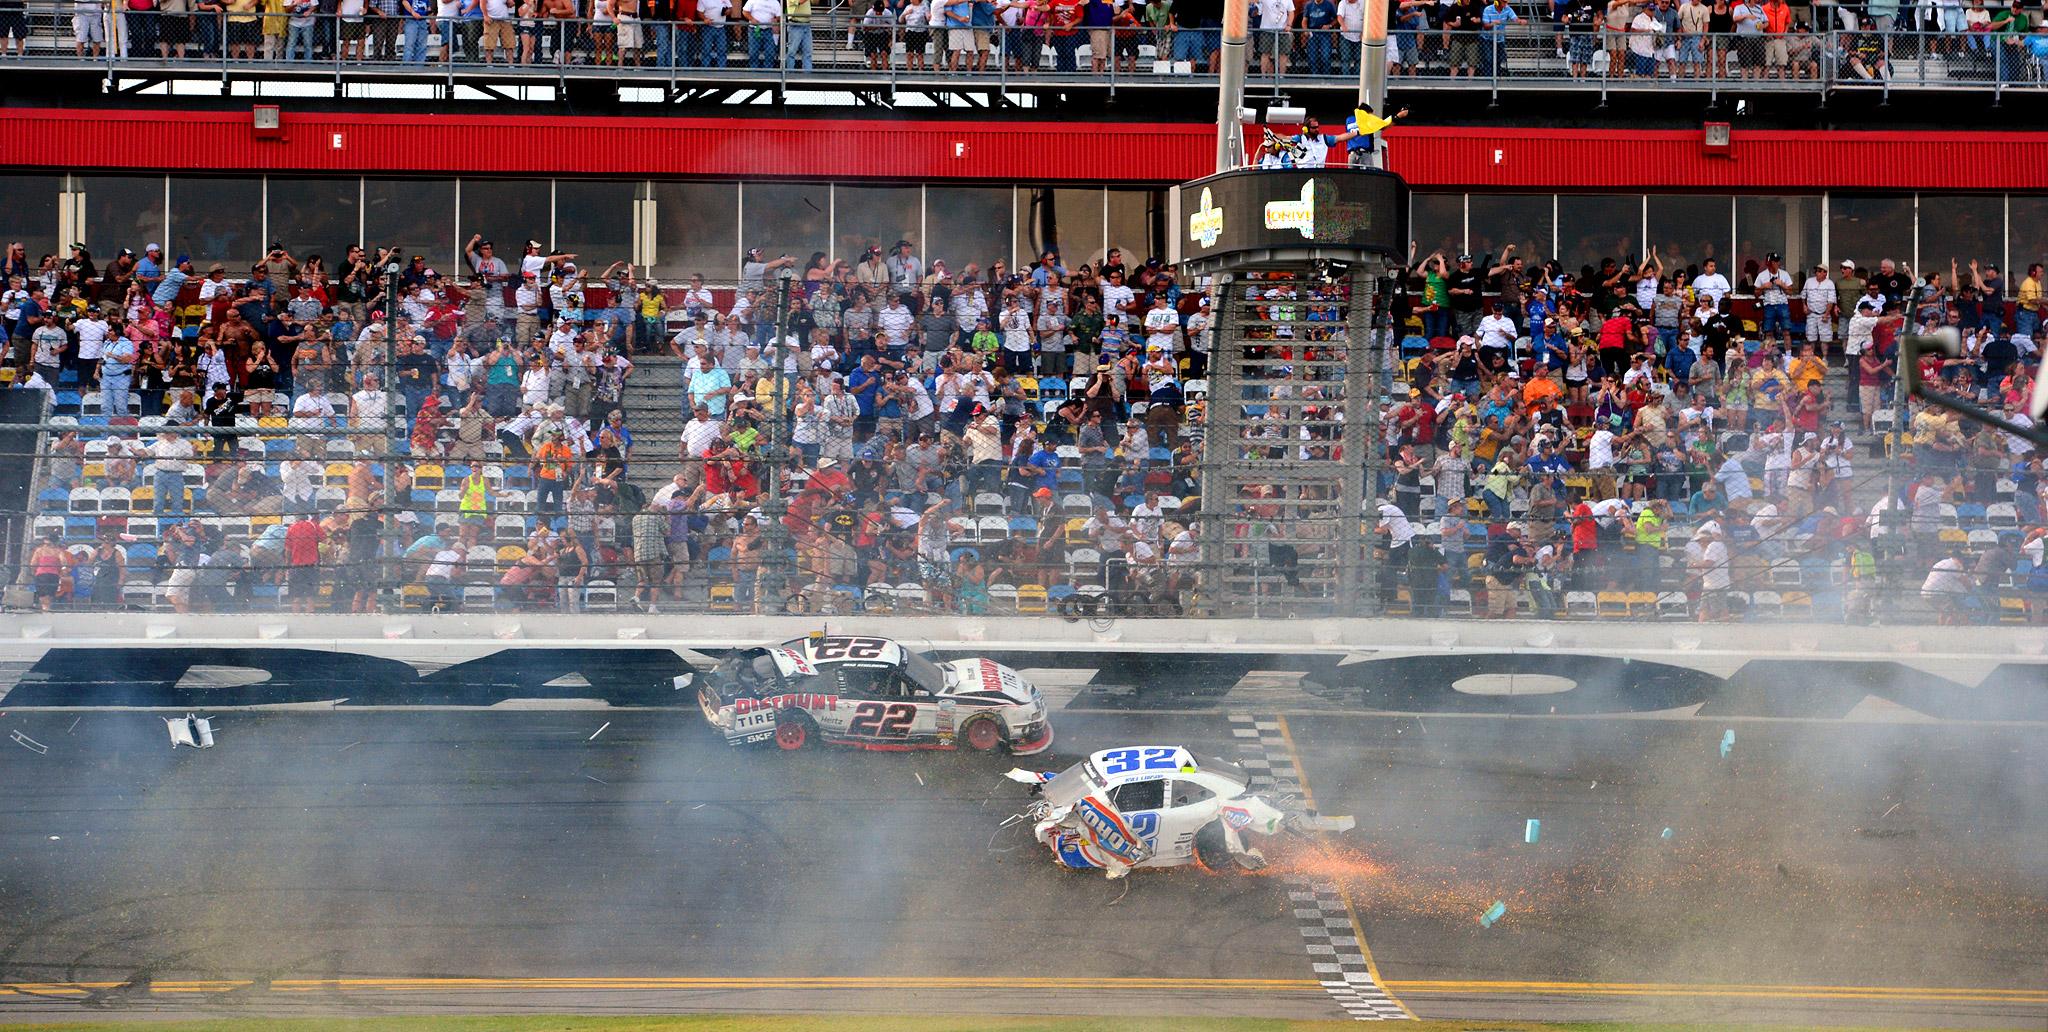 Kyle Larson's car crosses the finish line